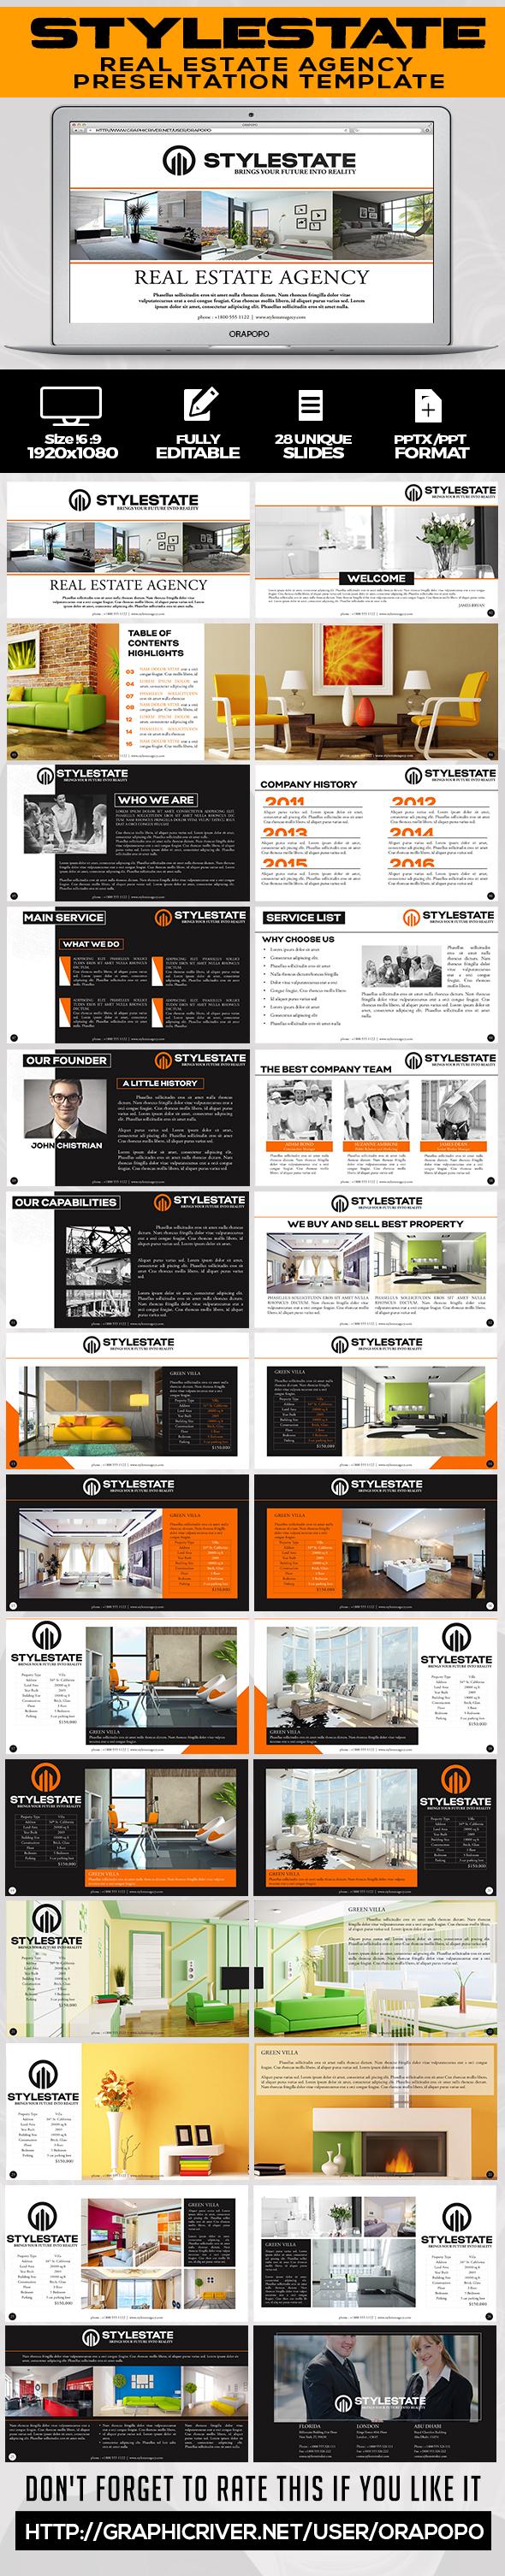 Stylestate | Real Estate Agency Presentation Template